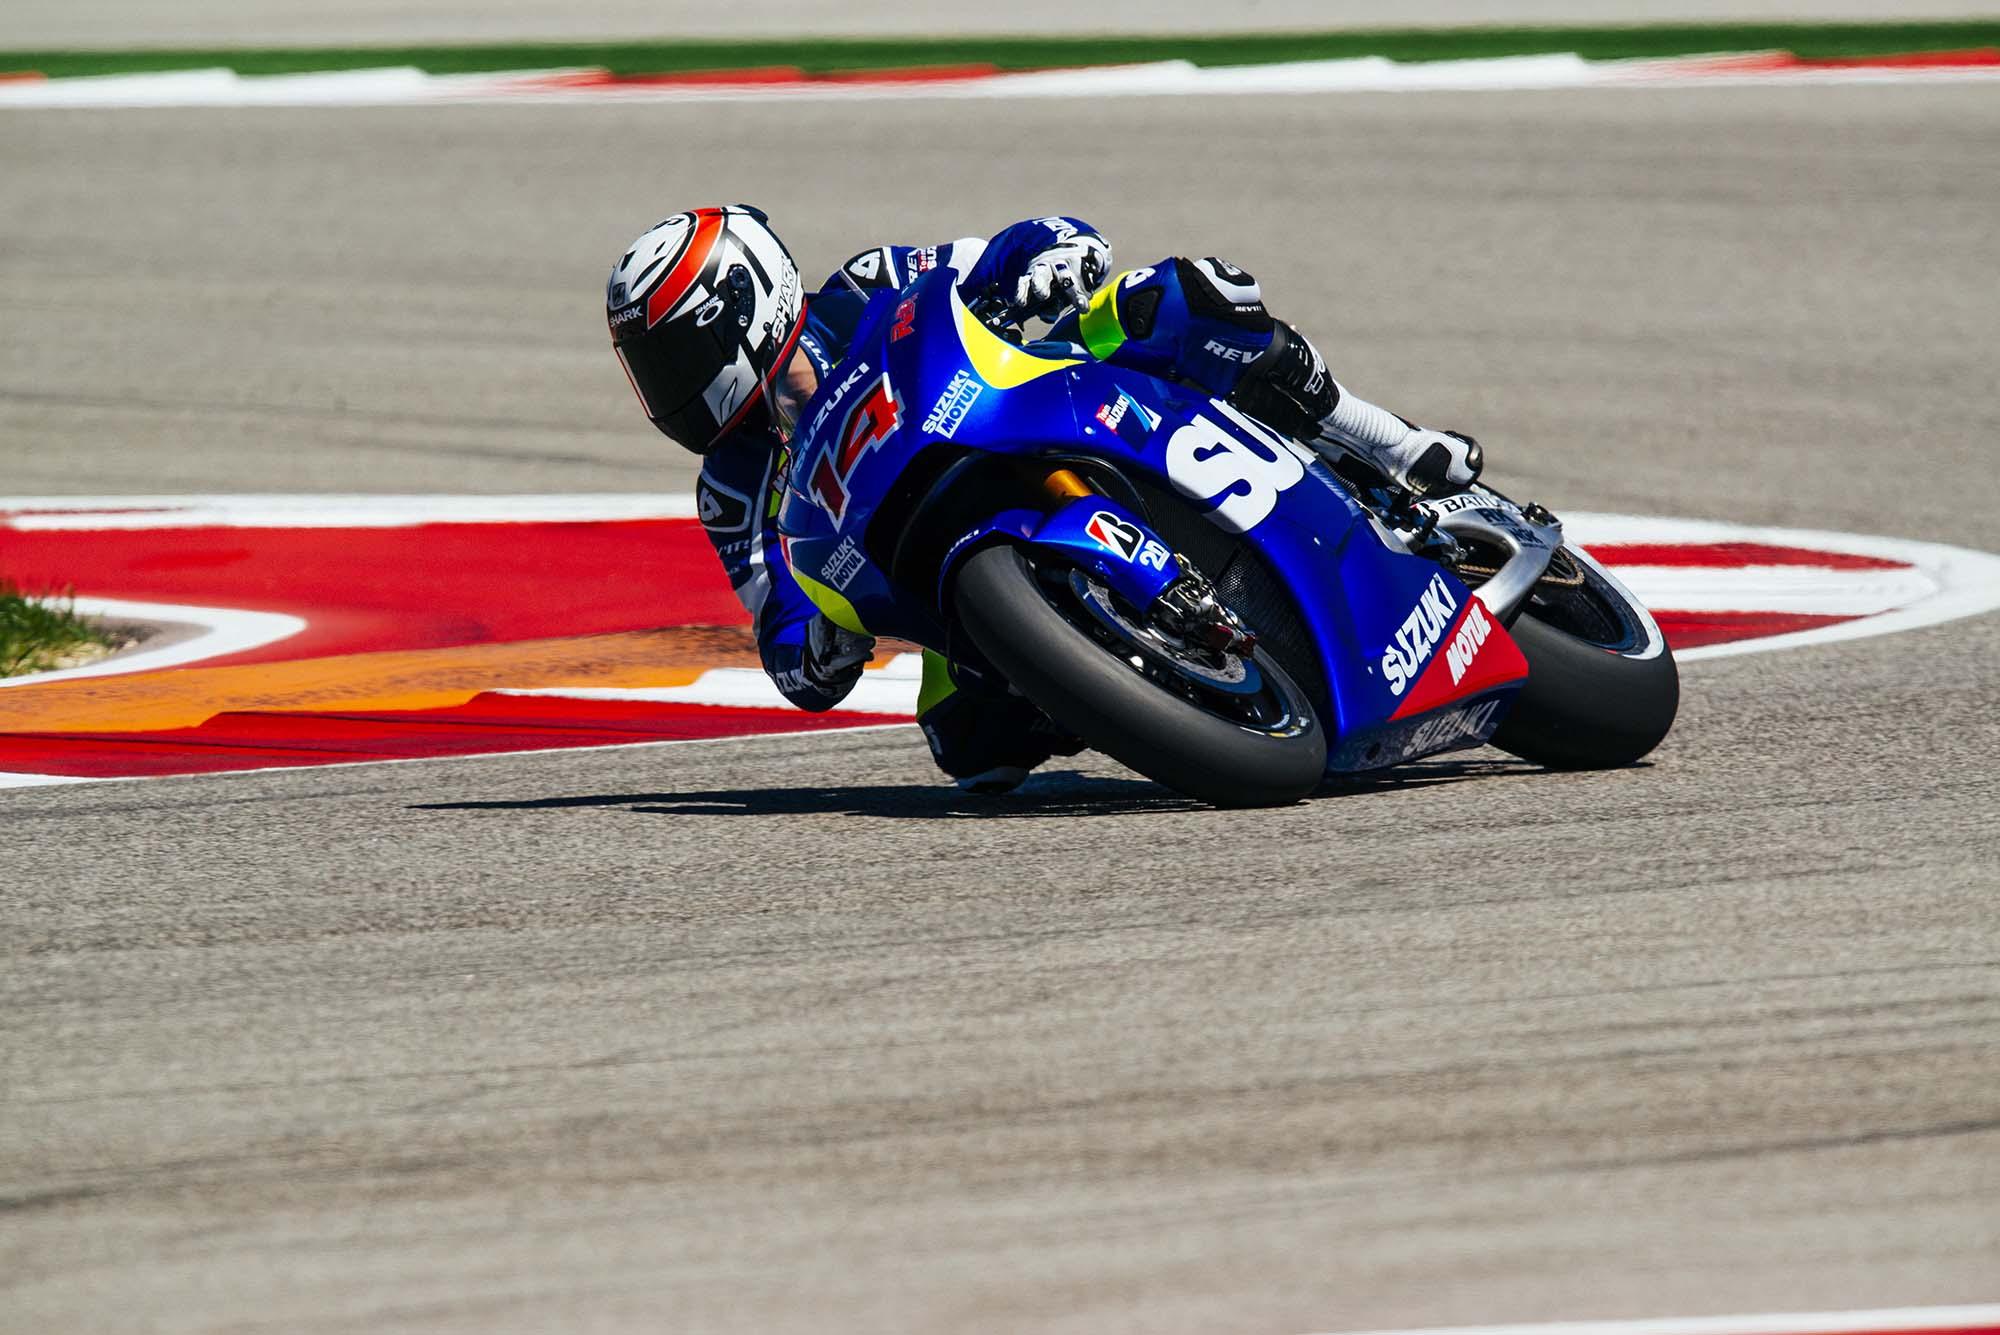 Kevin Schwantz Tests Suzuki XRH-1 MotoGP Bike at COTA ...